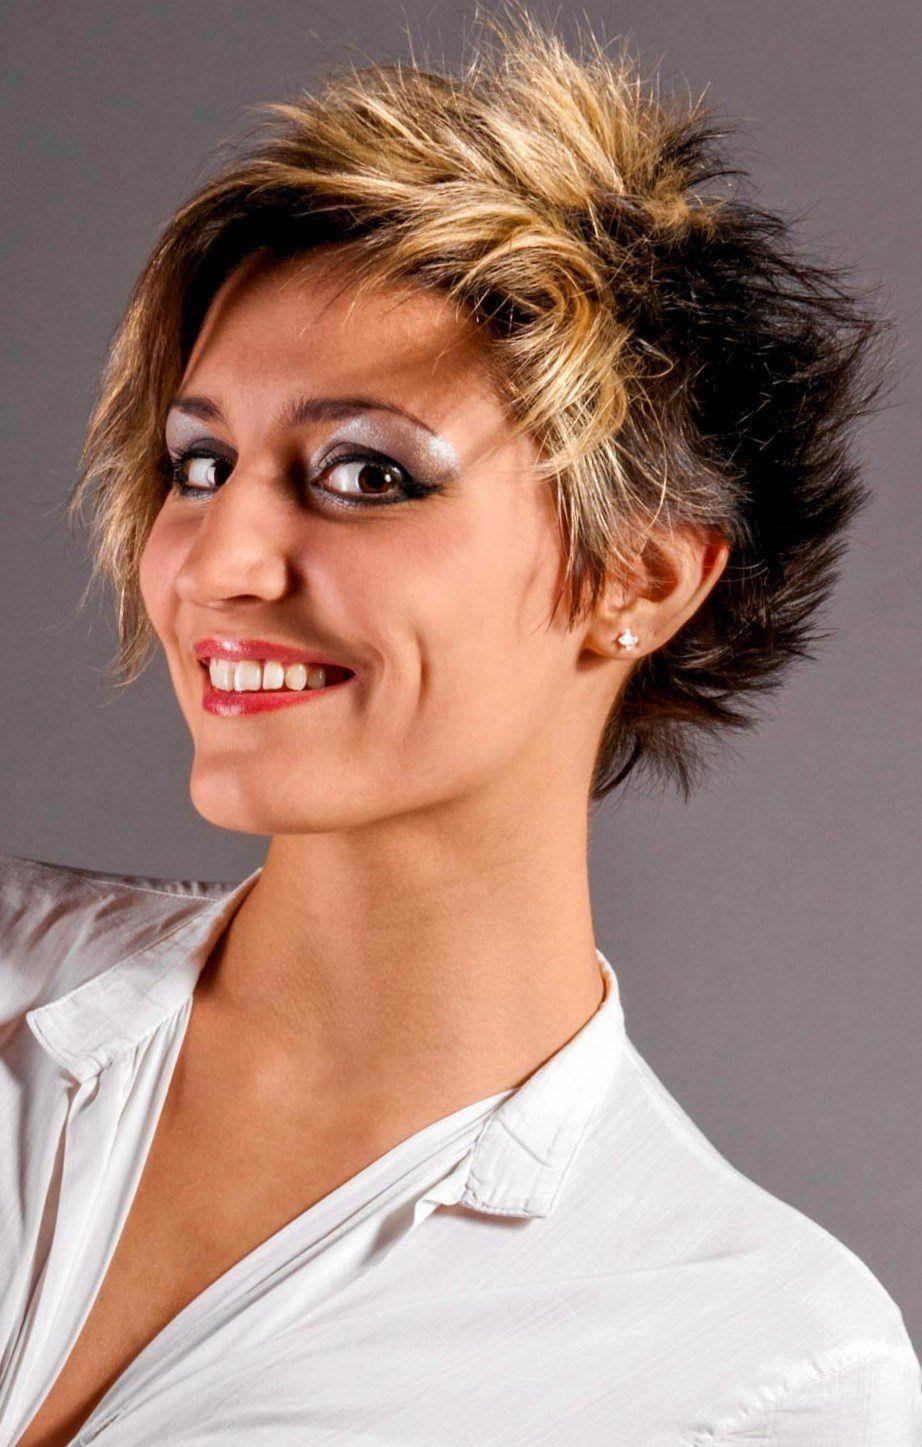 Helene Fischer Neue Frisur Stylehaare Info 422 Helene